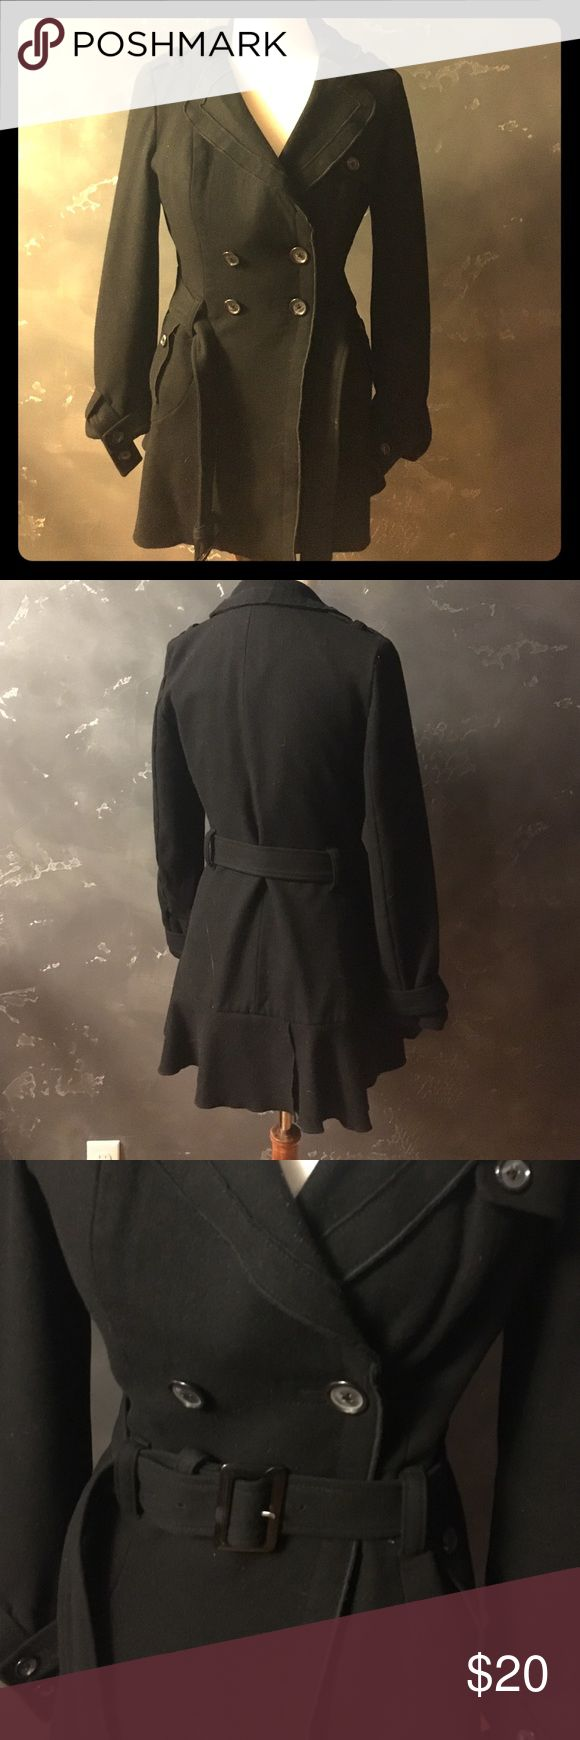 Black Pea Coat Stylish black pea coat. Used. Moda International Jackets & Coats Pea Coats